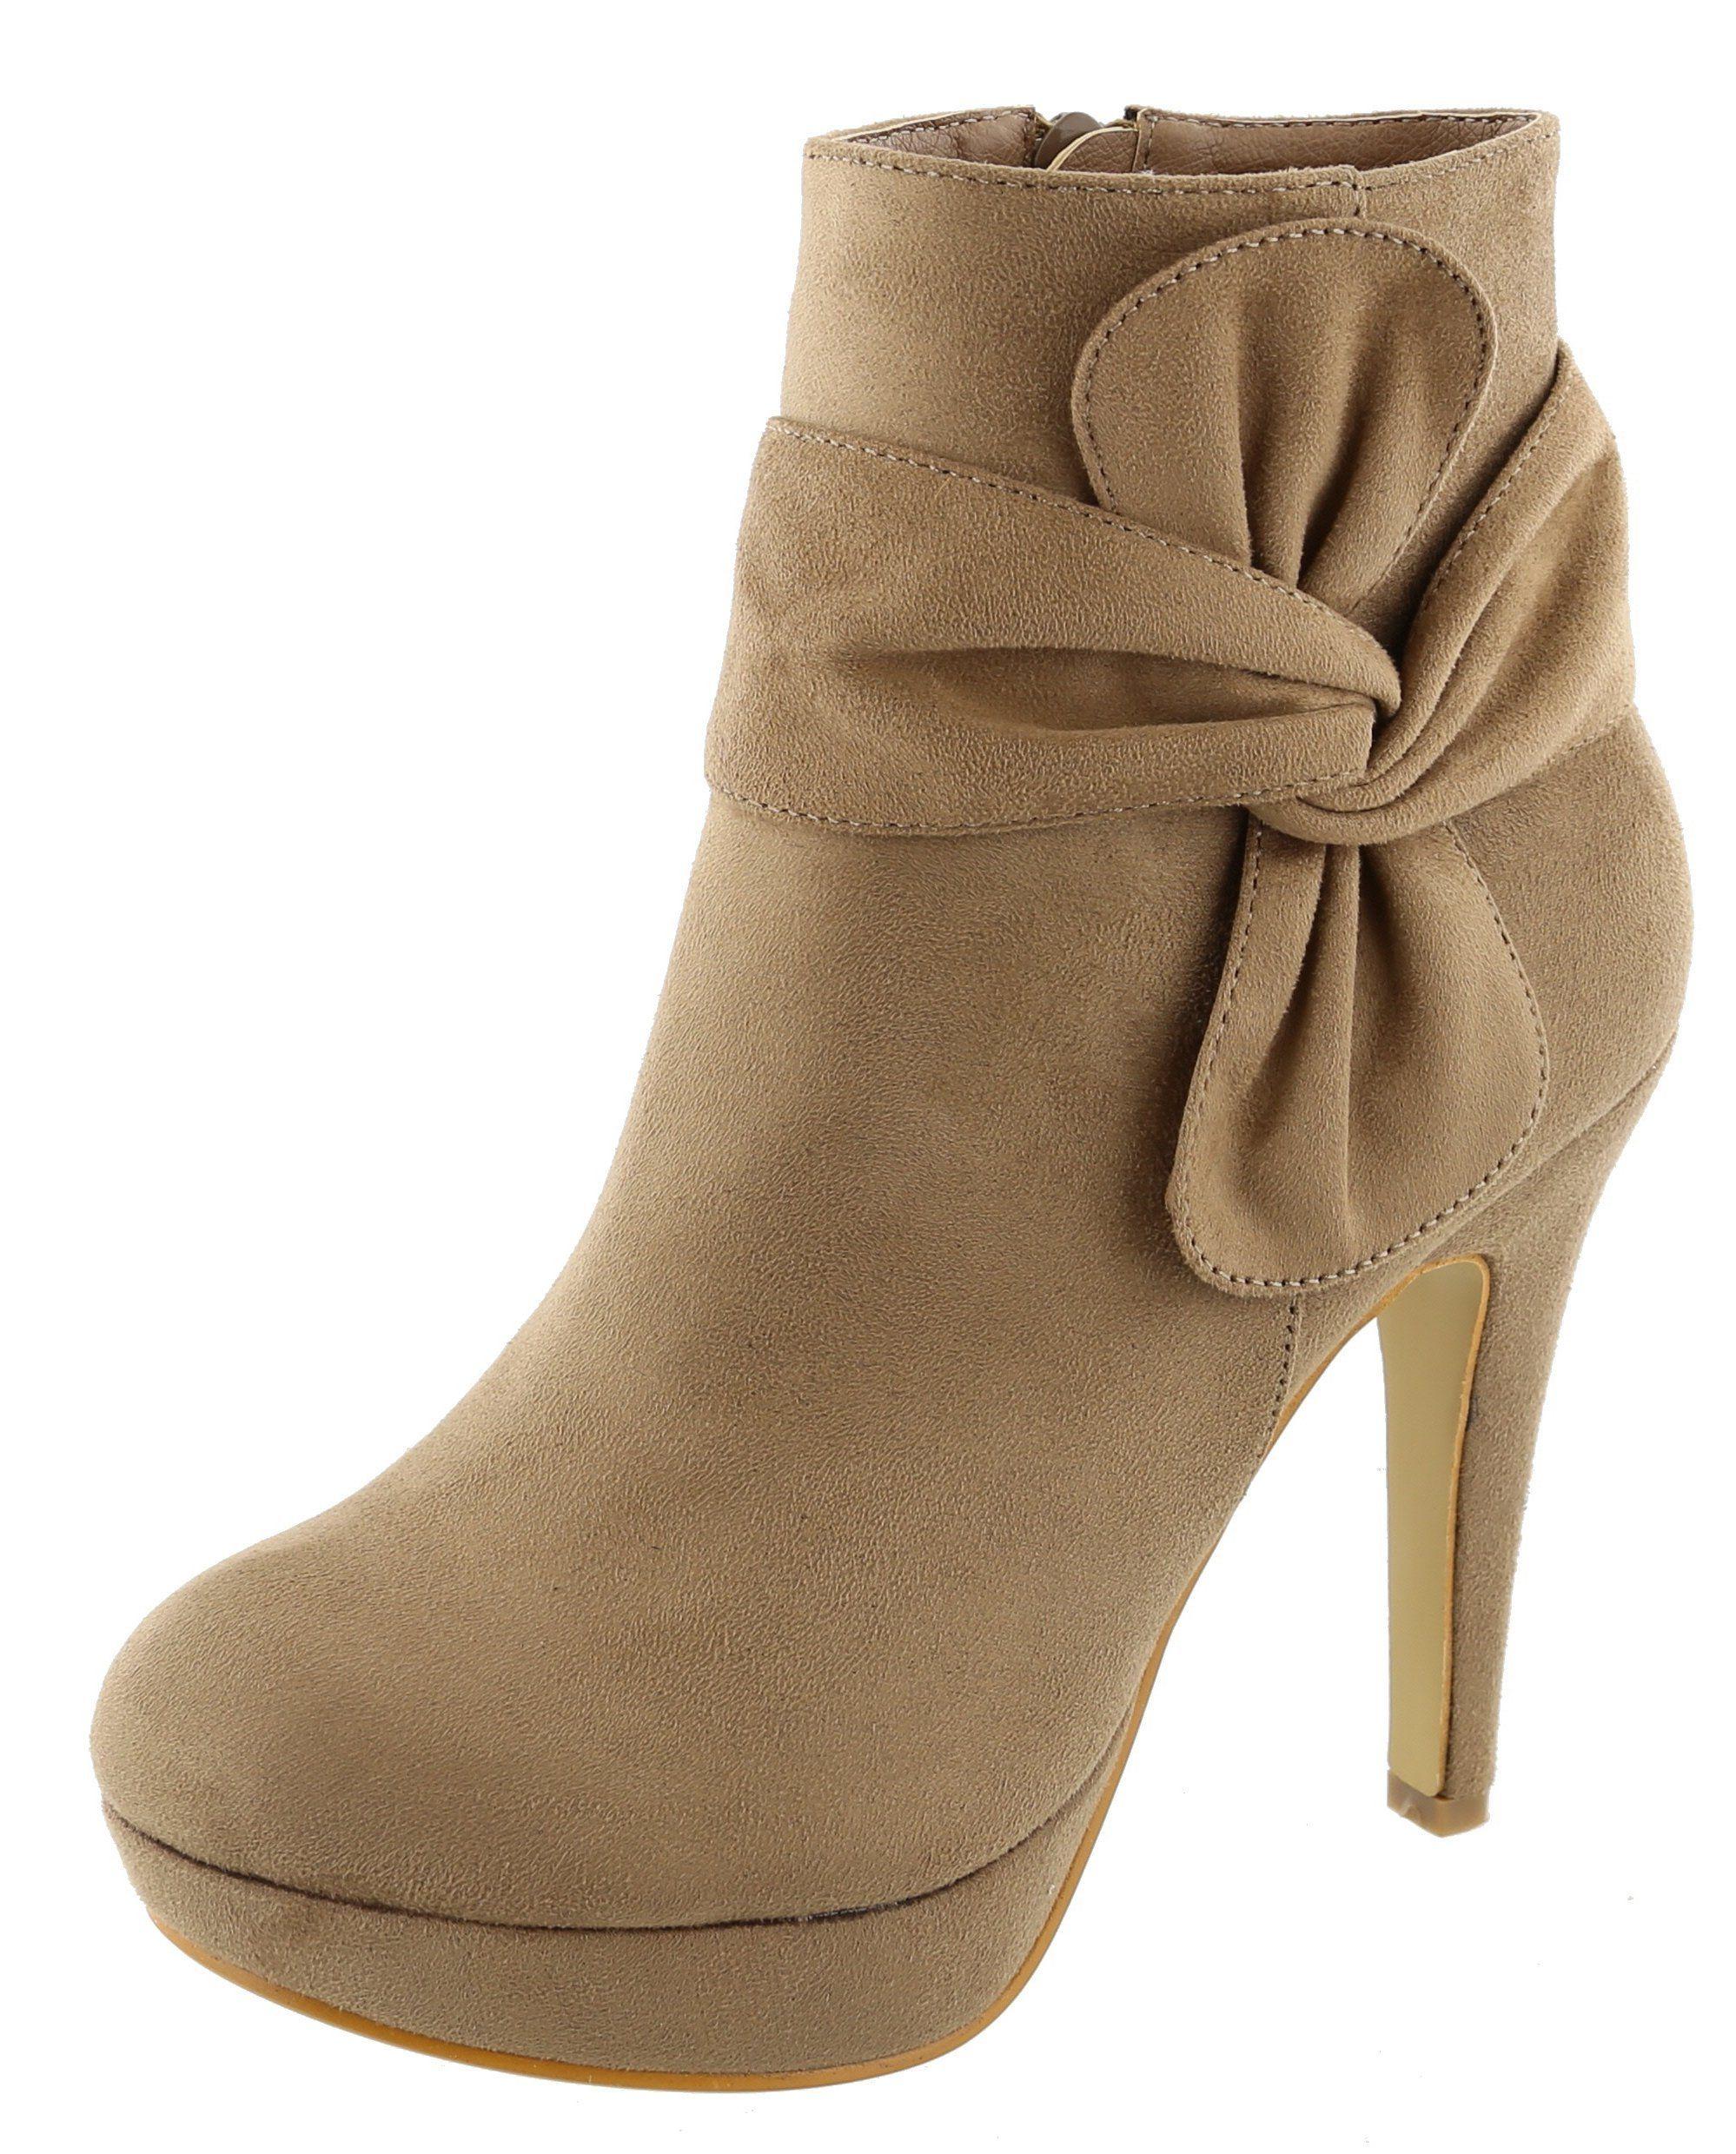 Women's Side Bow Knot Platform Stiletto High Heel Ankle Bootie